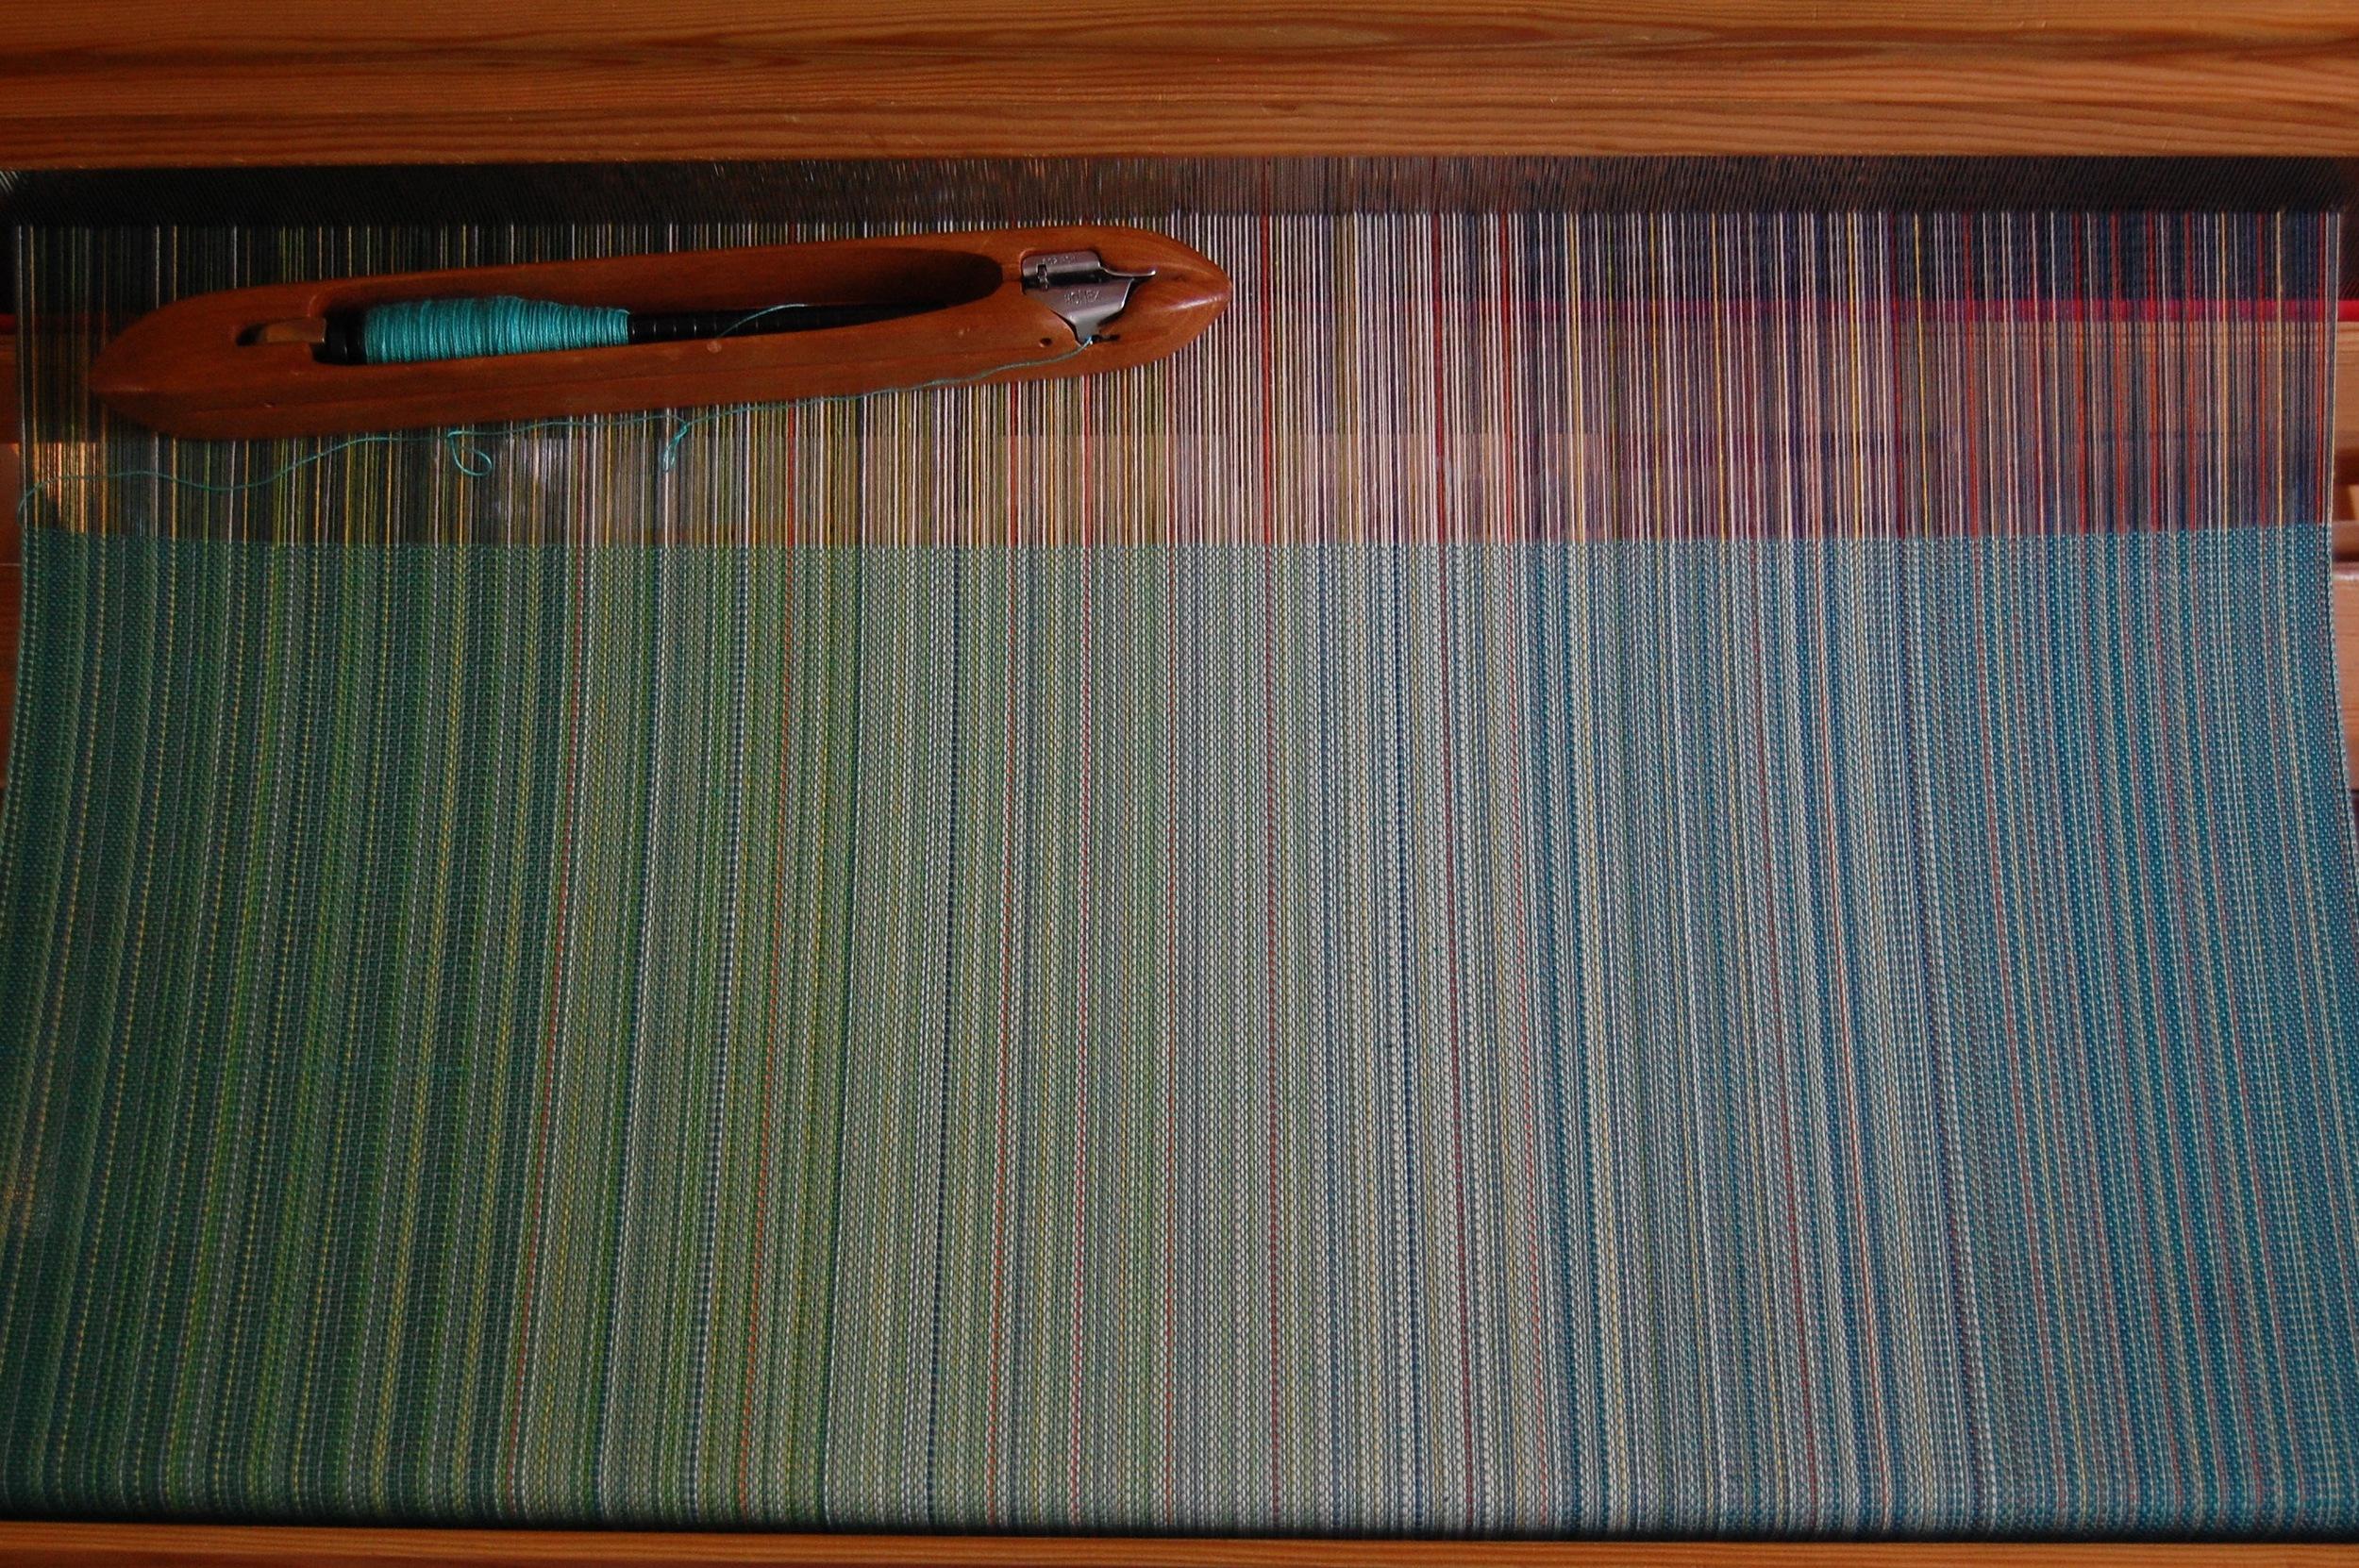 blue-green Egyptian cotton weft